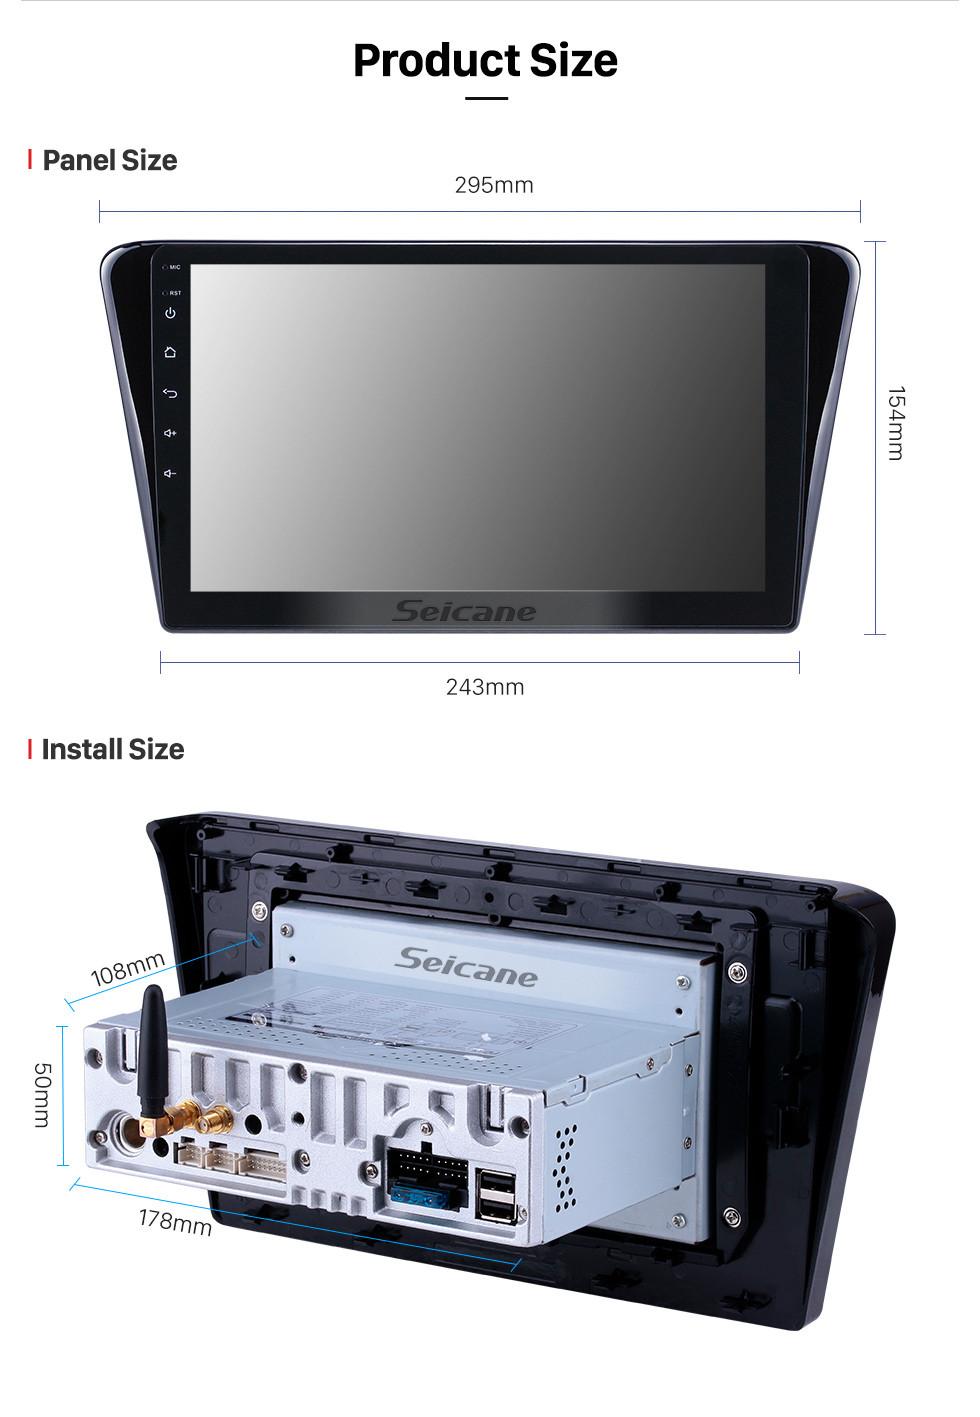 Seicane HD-Touchscreen 10,1 Zoll Android 9.0 GPS-Navigationsradio für 2014 Peugeot 408 mit Bluetooth Wifi USB Carplay-Unterstützung DVR DAB + Lenkradsteuerung